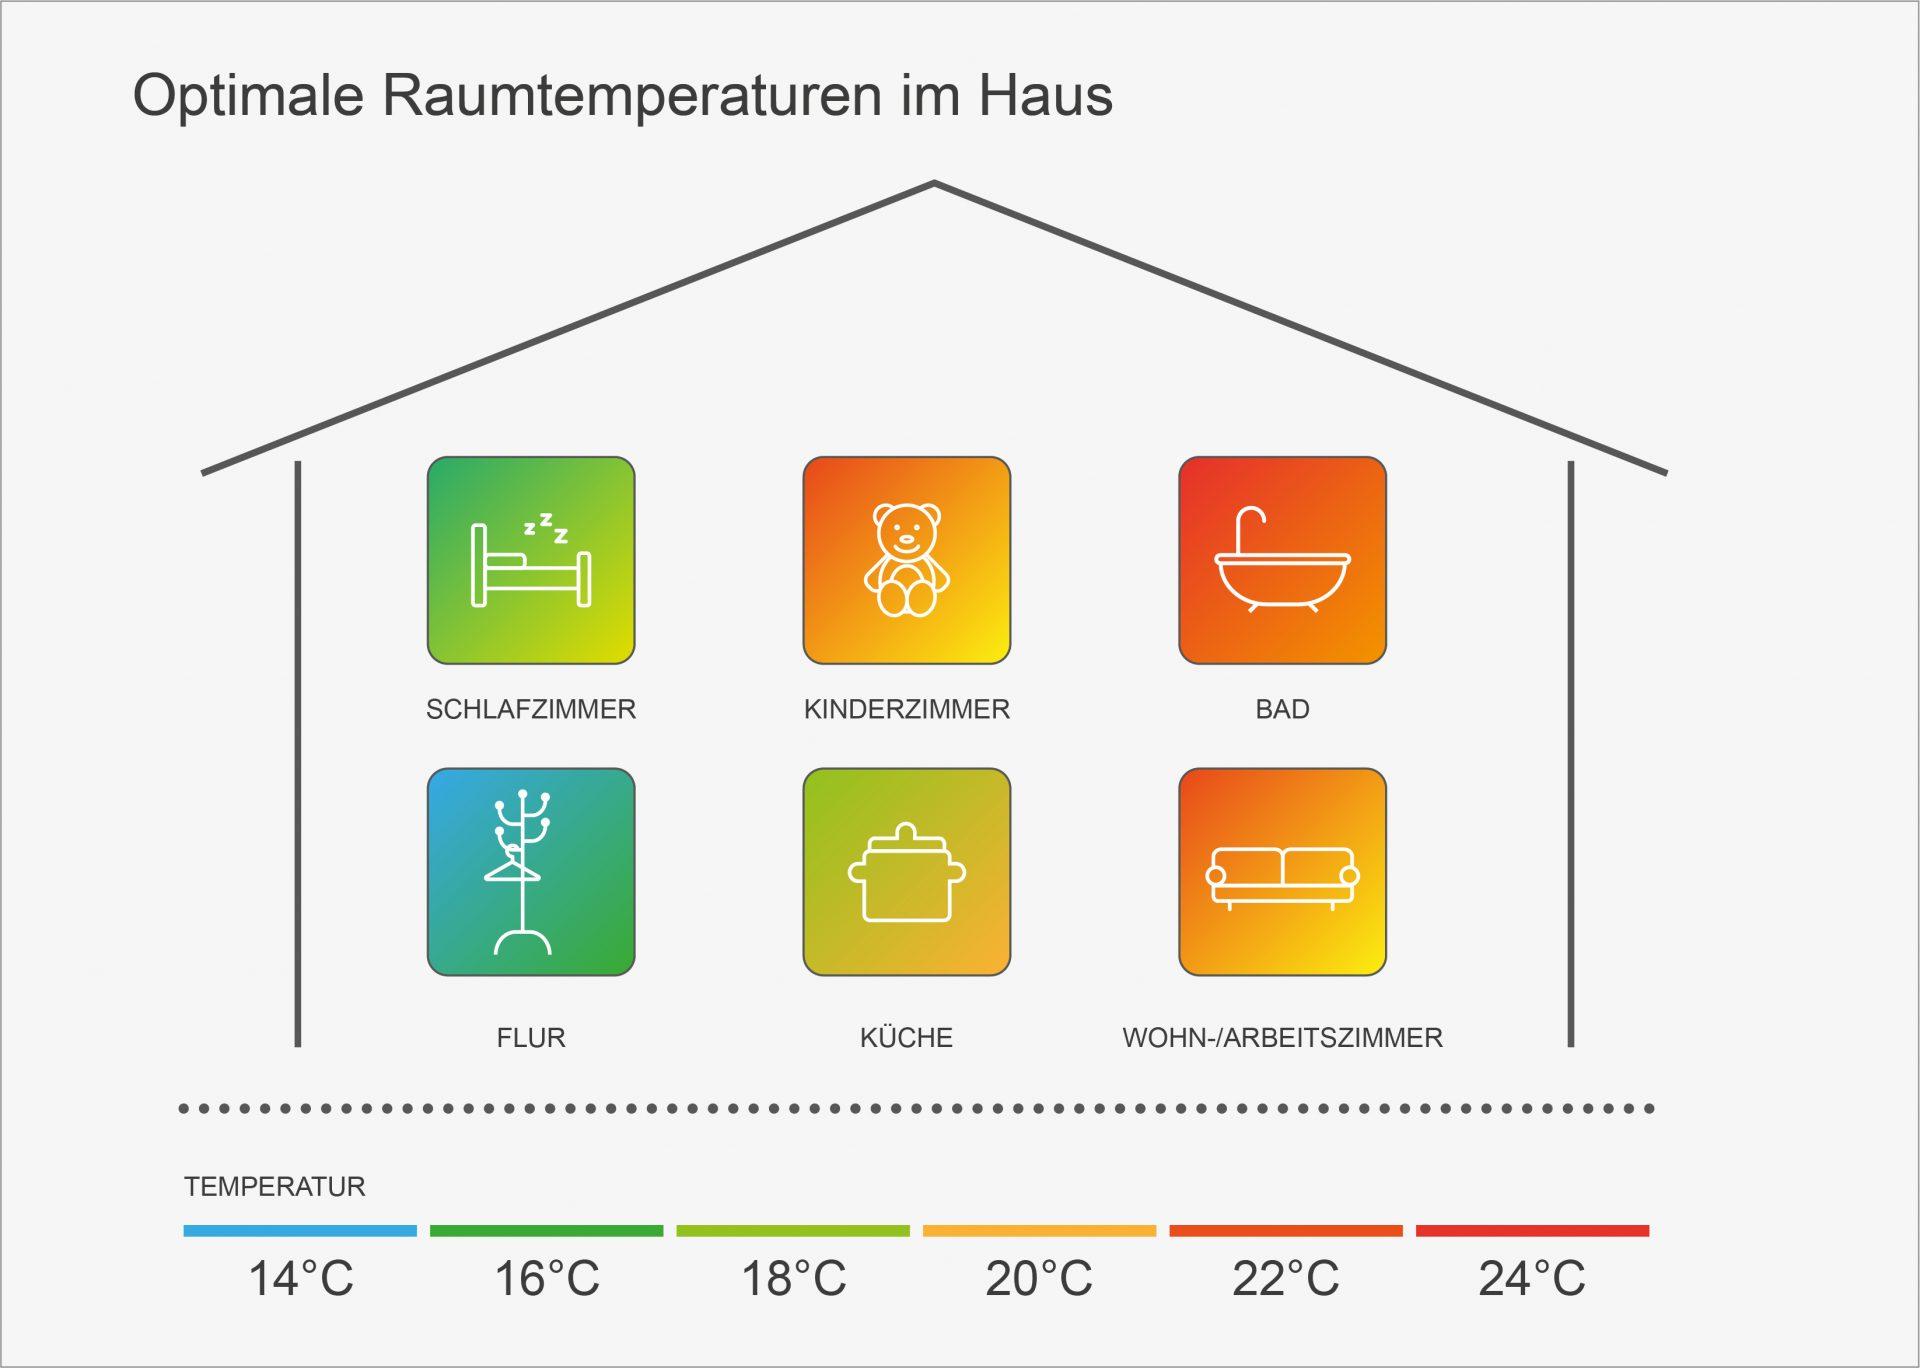 Feuchtemessung Schimmelsanierung Optimale Raumtemperatur Skala